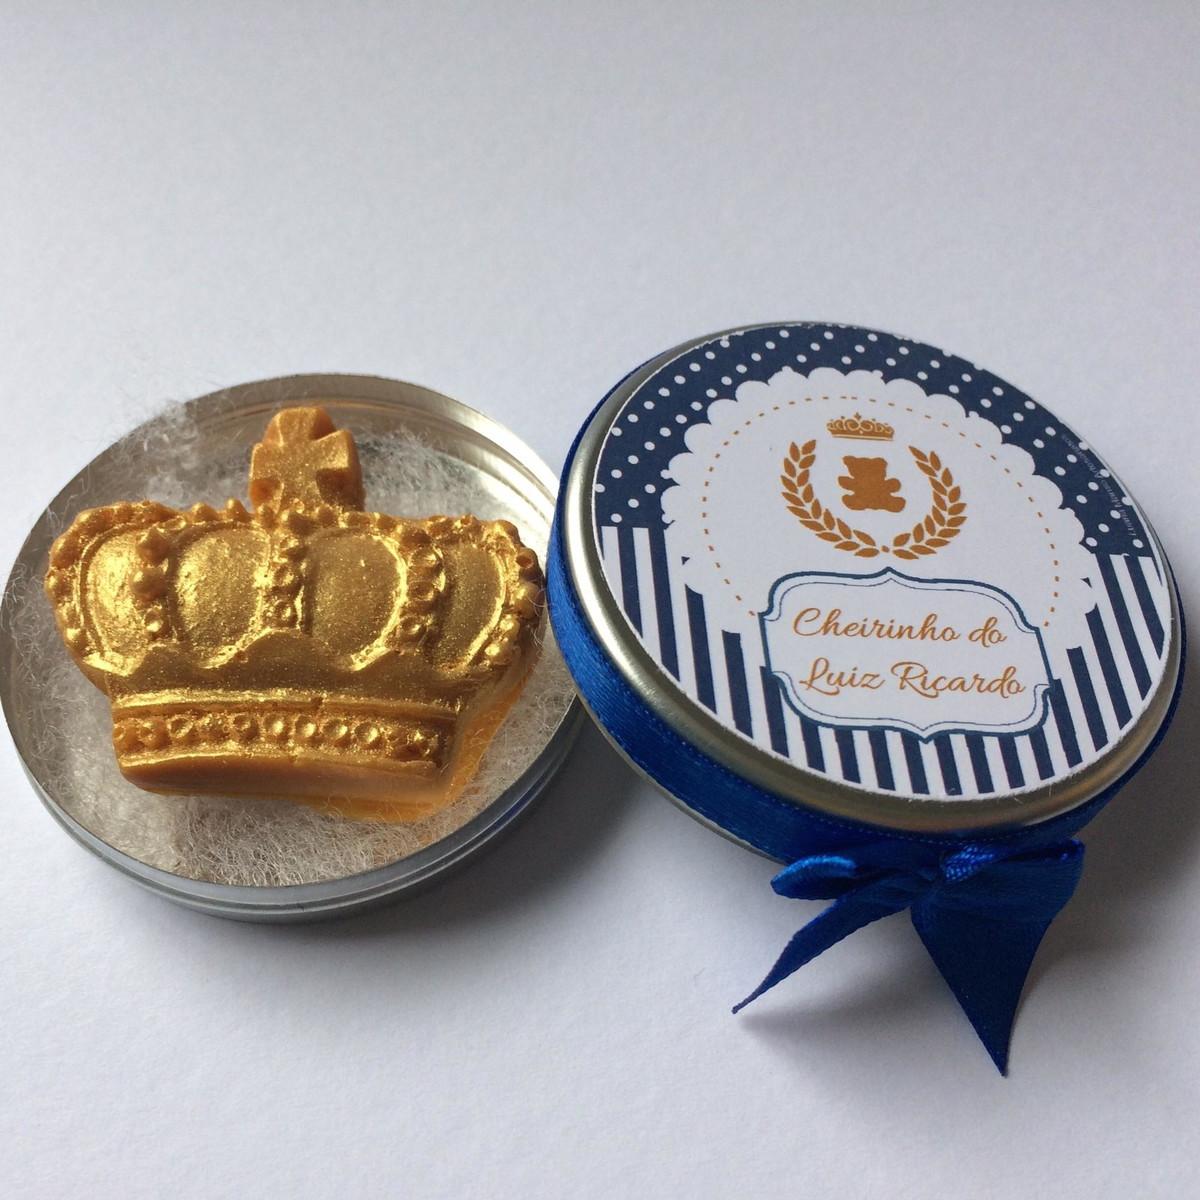 lembrancinhas de maternidade de chaveiro de coroa principe